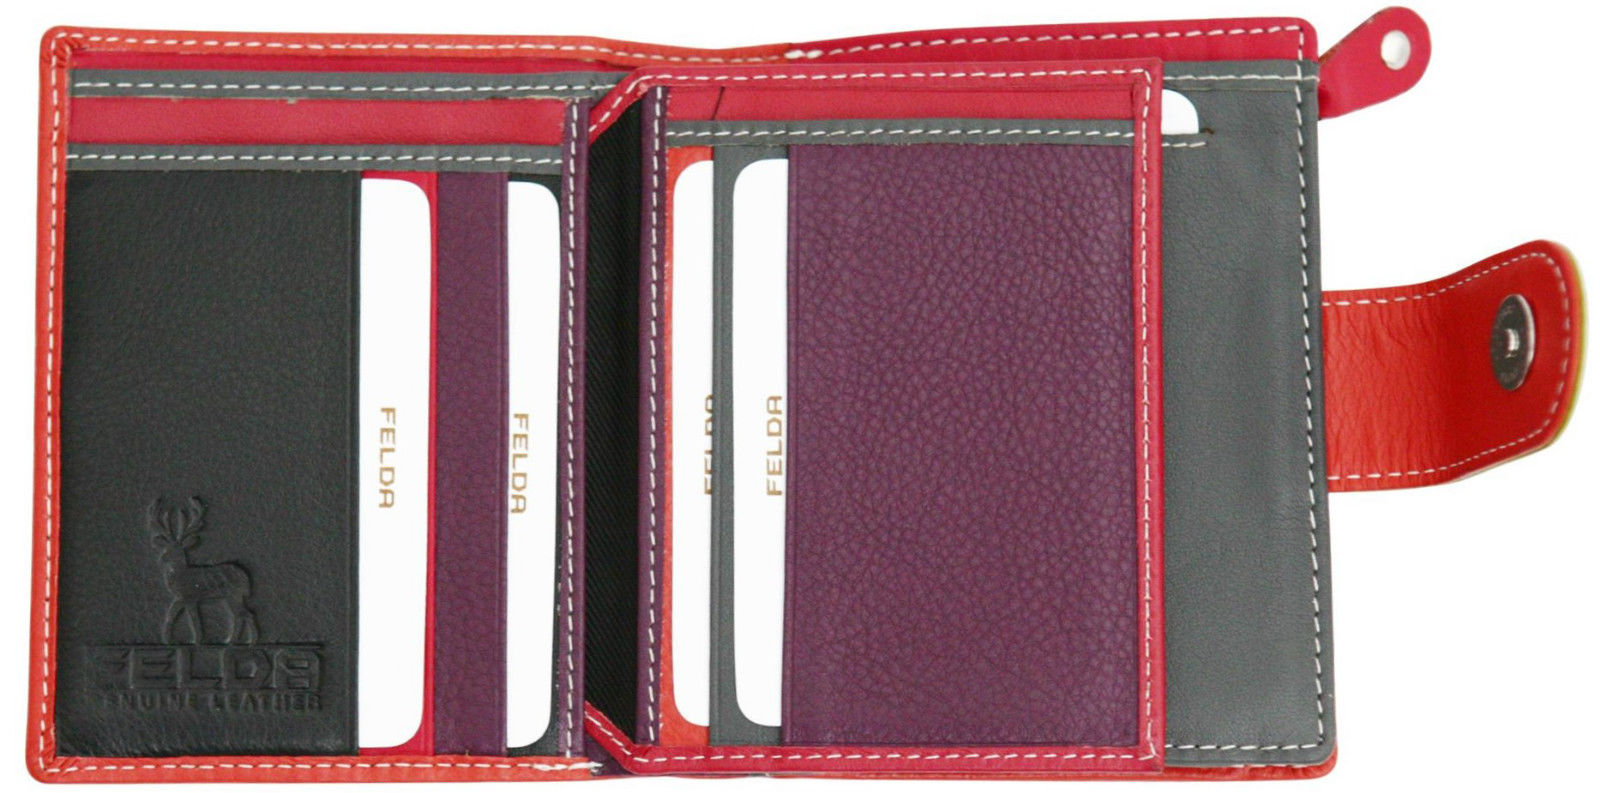 Felda-RFID-onorevoli-MEDAGLIA-amp-Card-Purse-Wallet-Genuine-Leather-Multi-SOFT-BOX-REGALO miniatura 68